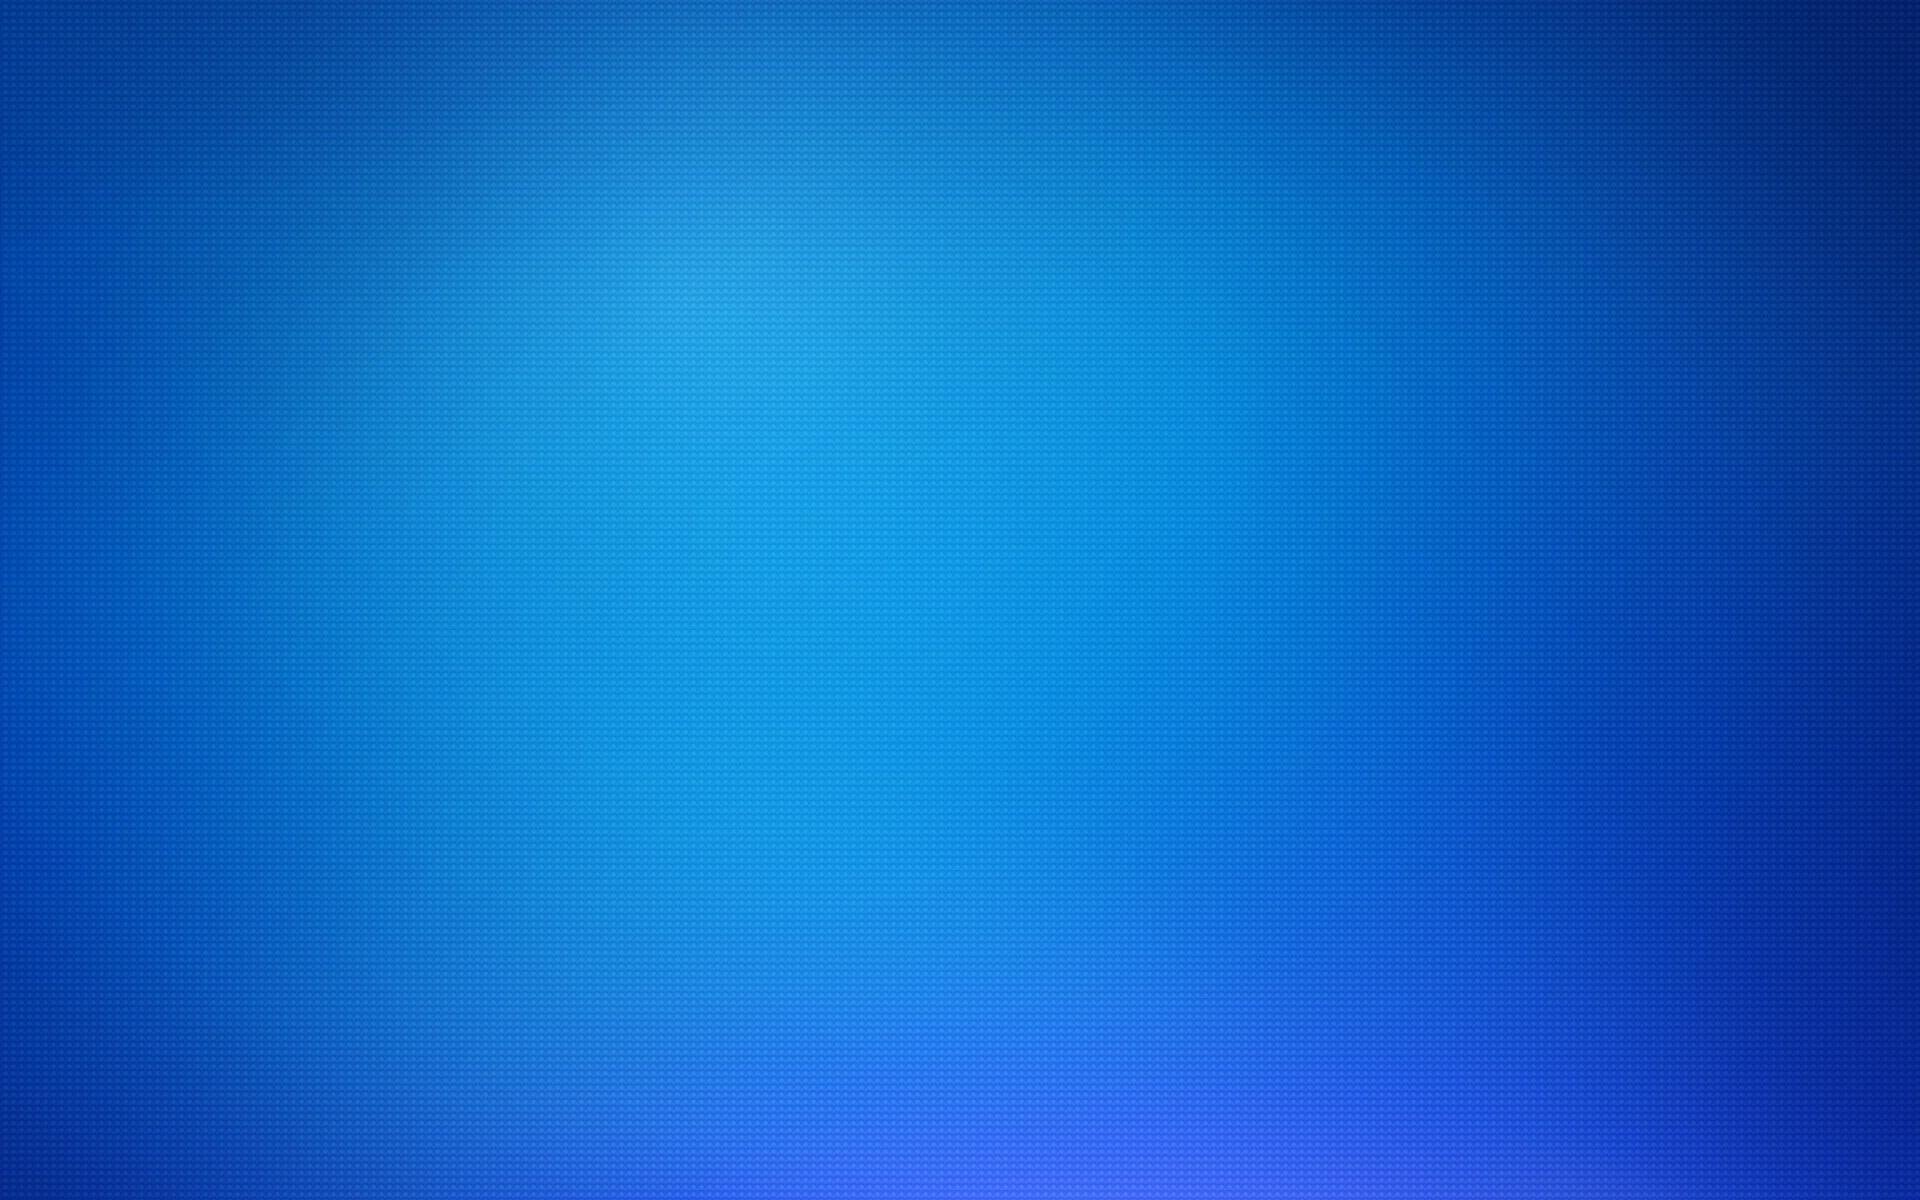 73 Plain Blue Background Wallpaper On Wallpapersafari